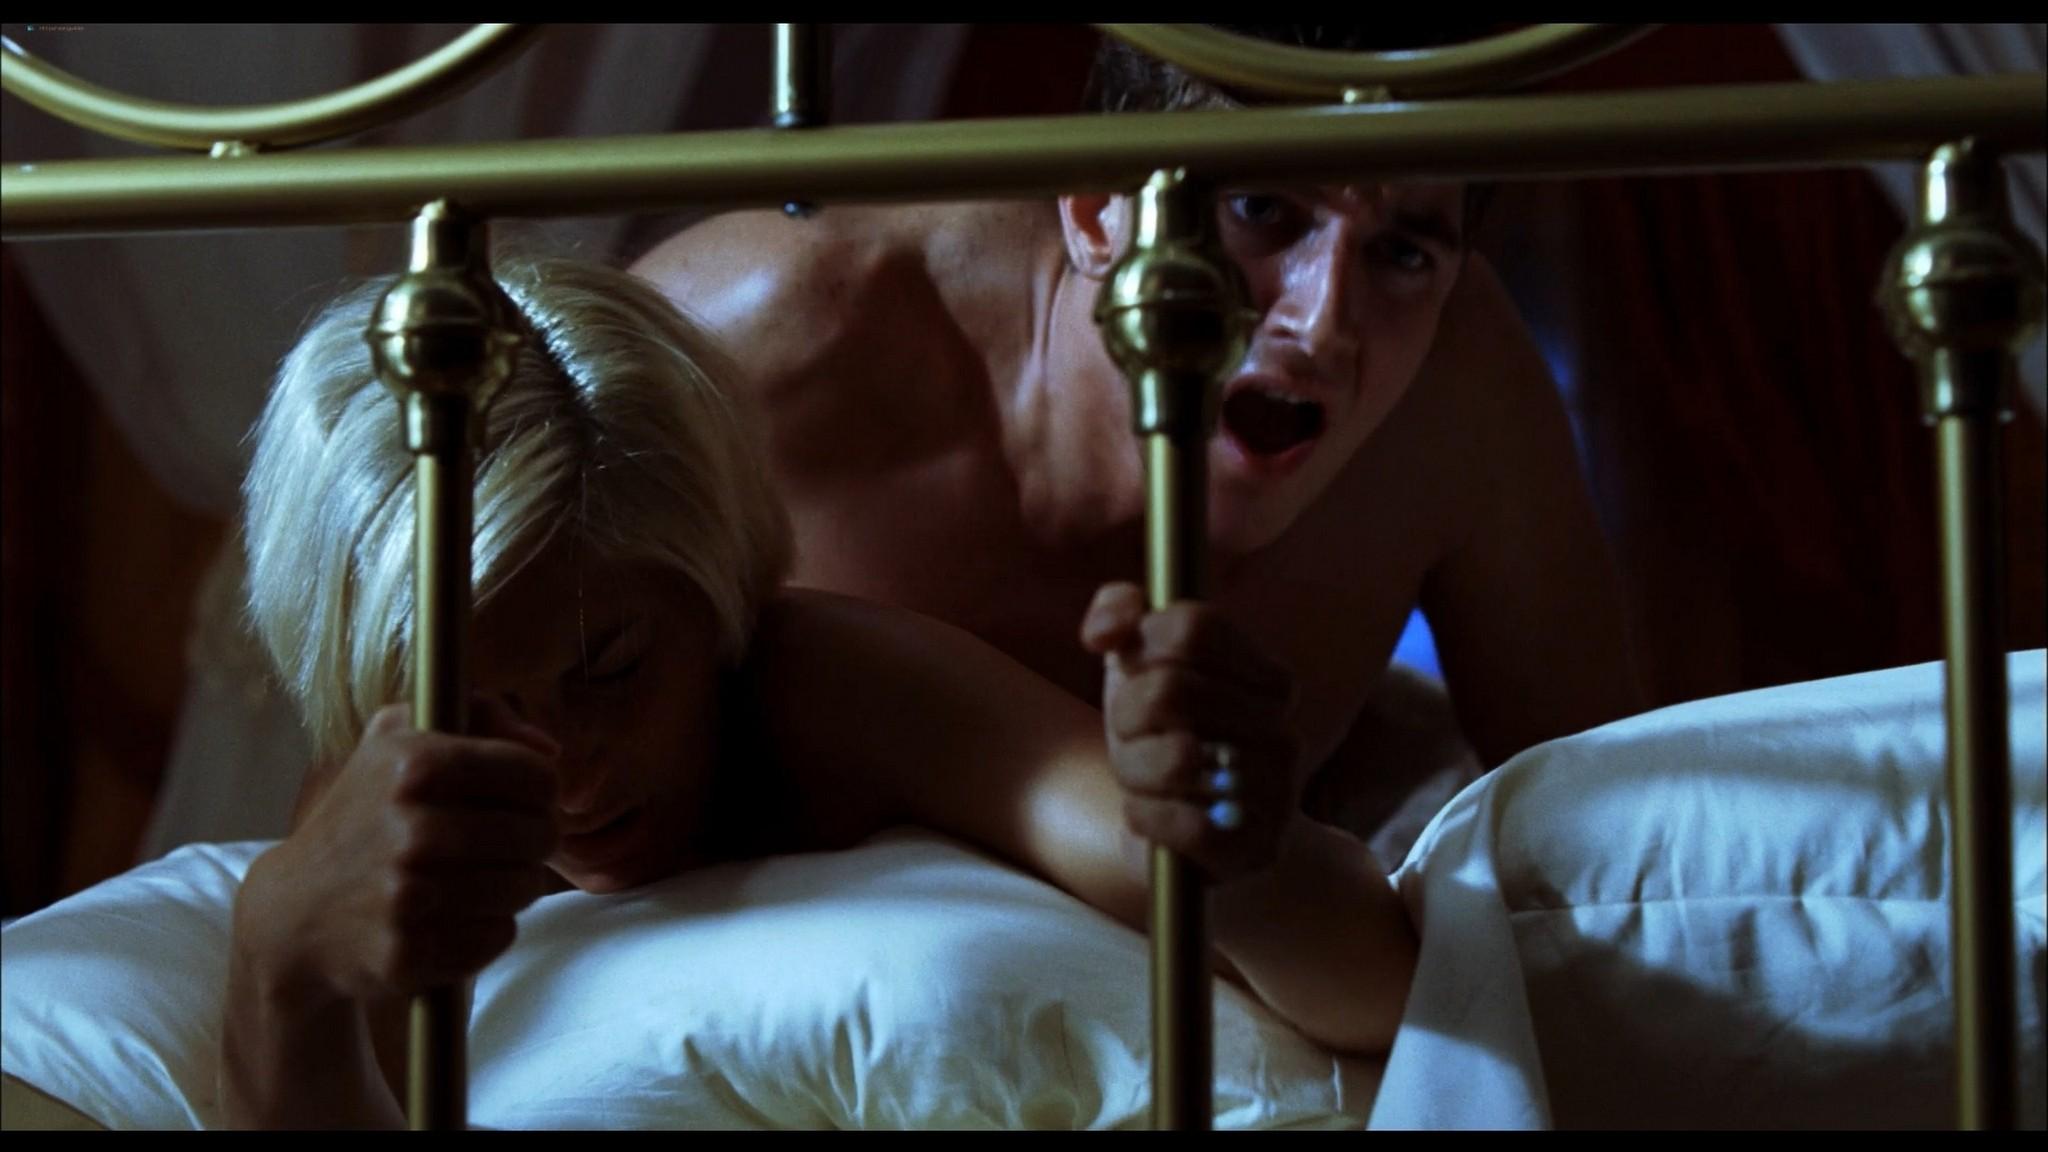 Avalon Barrie nude and Lyudmila Shiryaeva nude full frontal Sappho 2008 HD 1080p BluRay REMUX 7